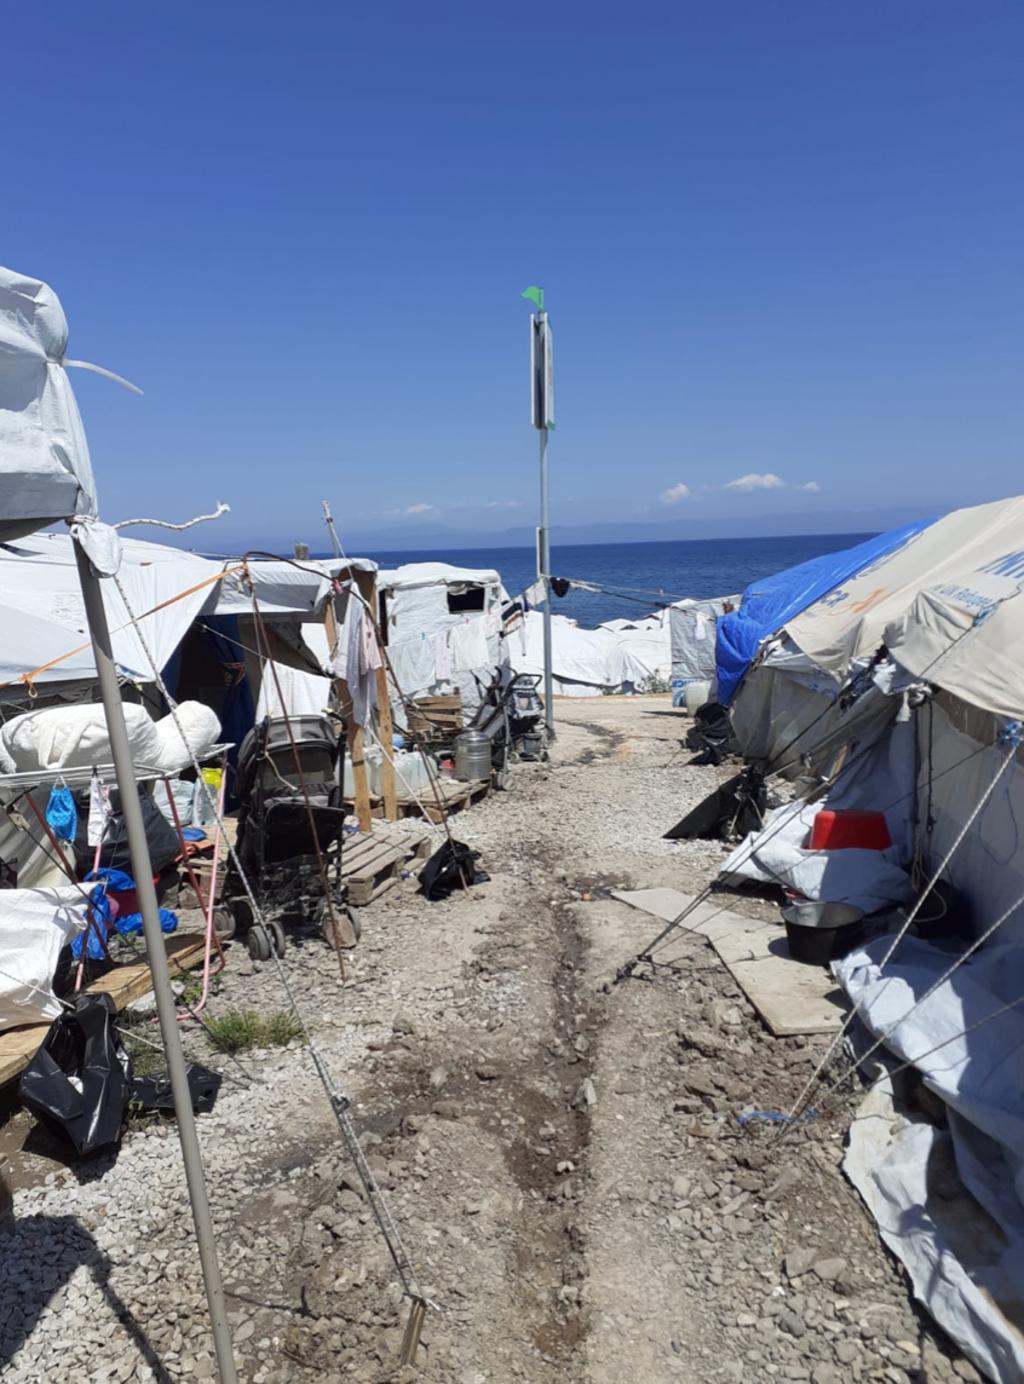 Het kamp. Foto:  © Uitkijkpost Media B.v.